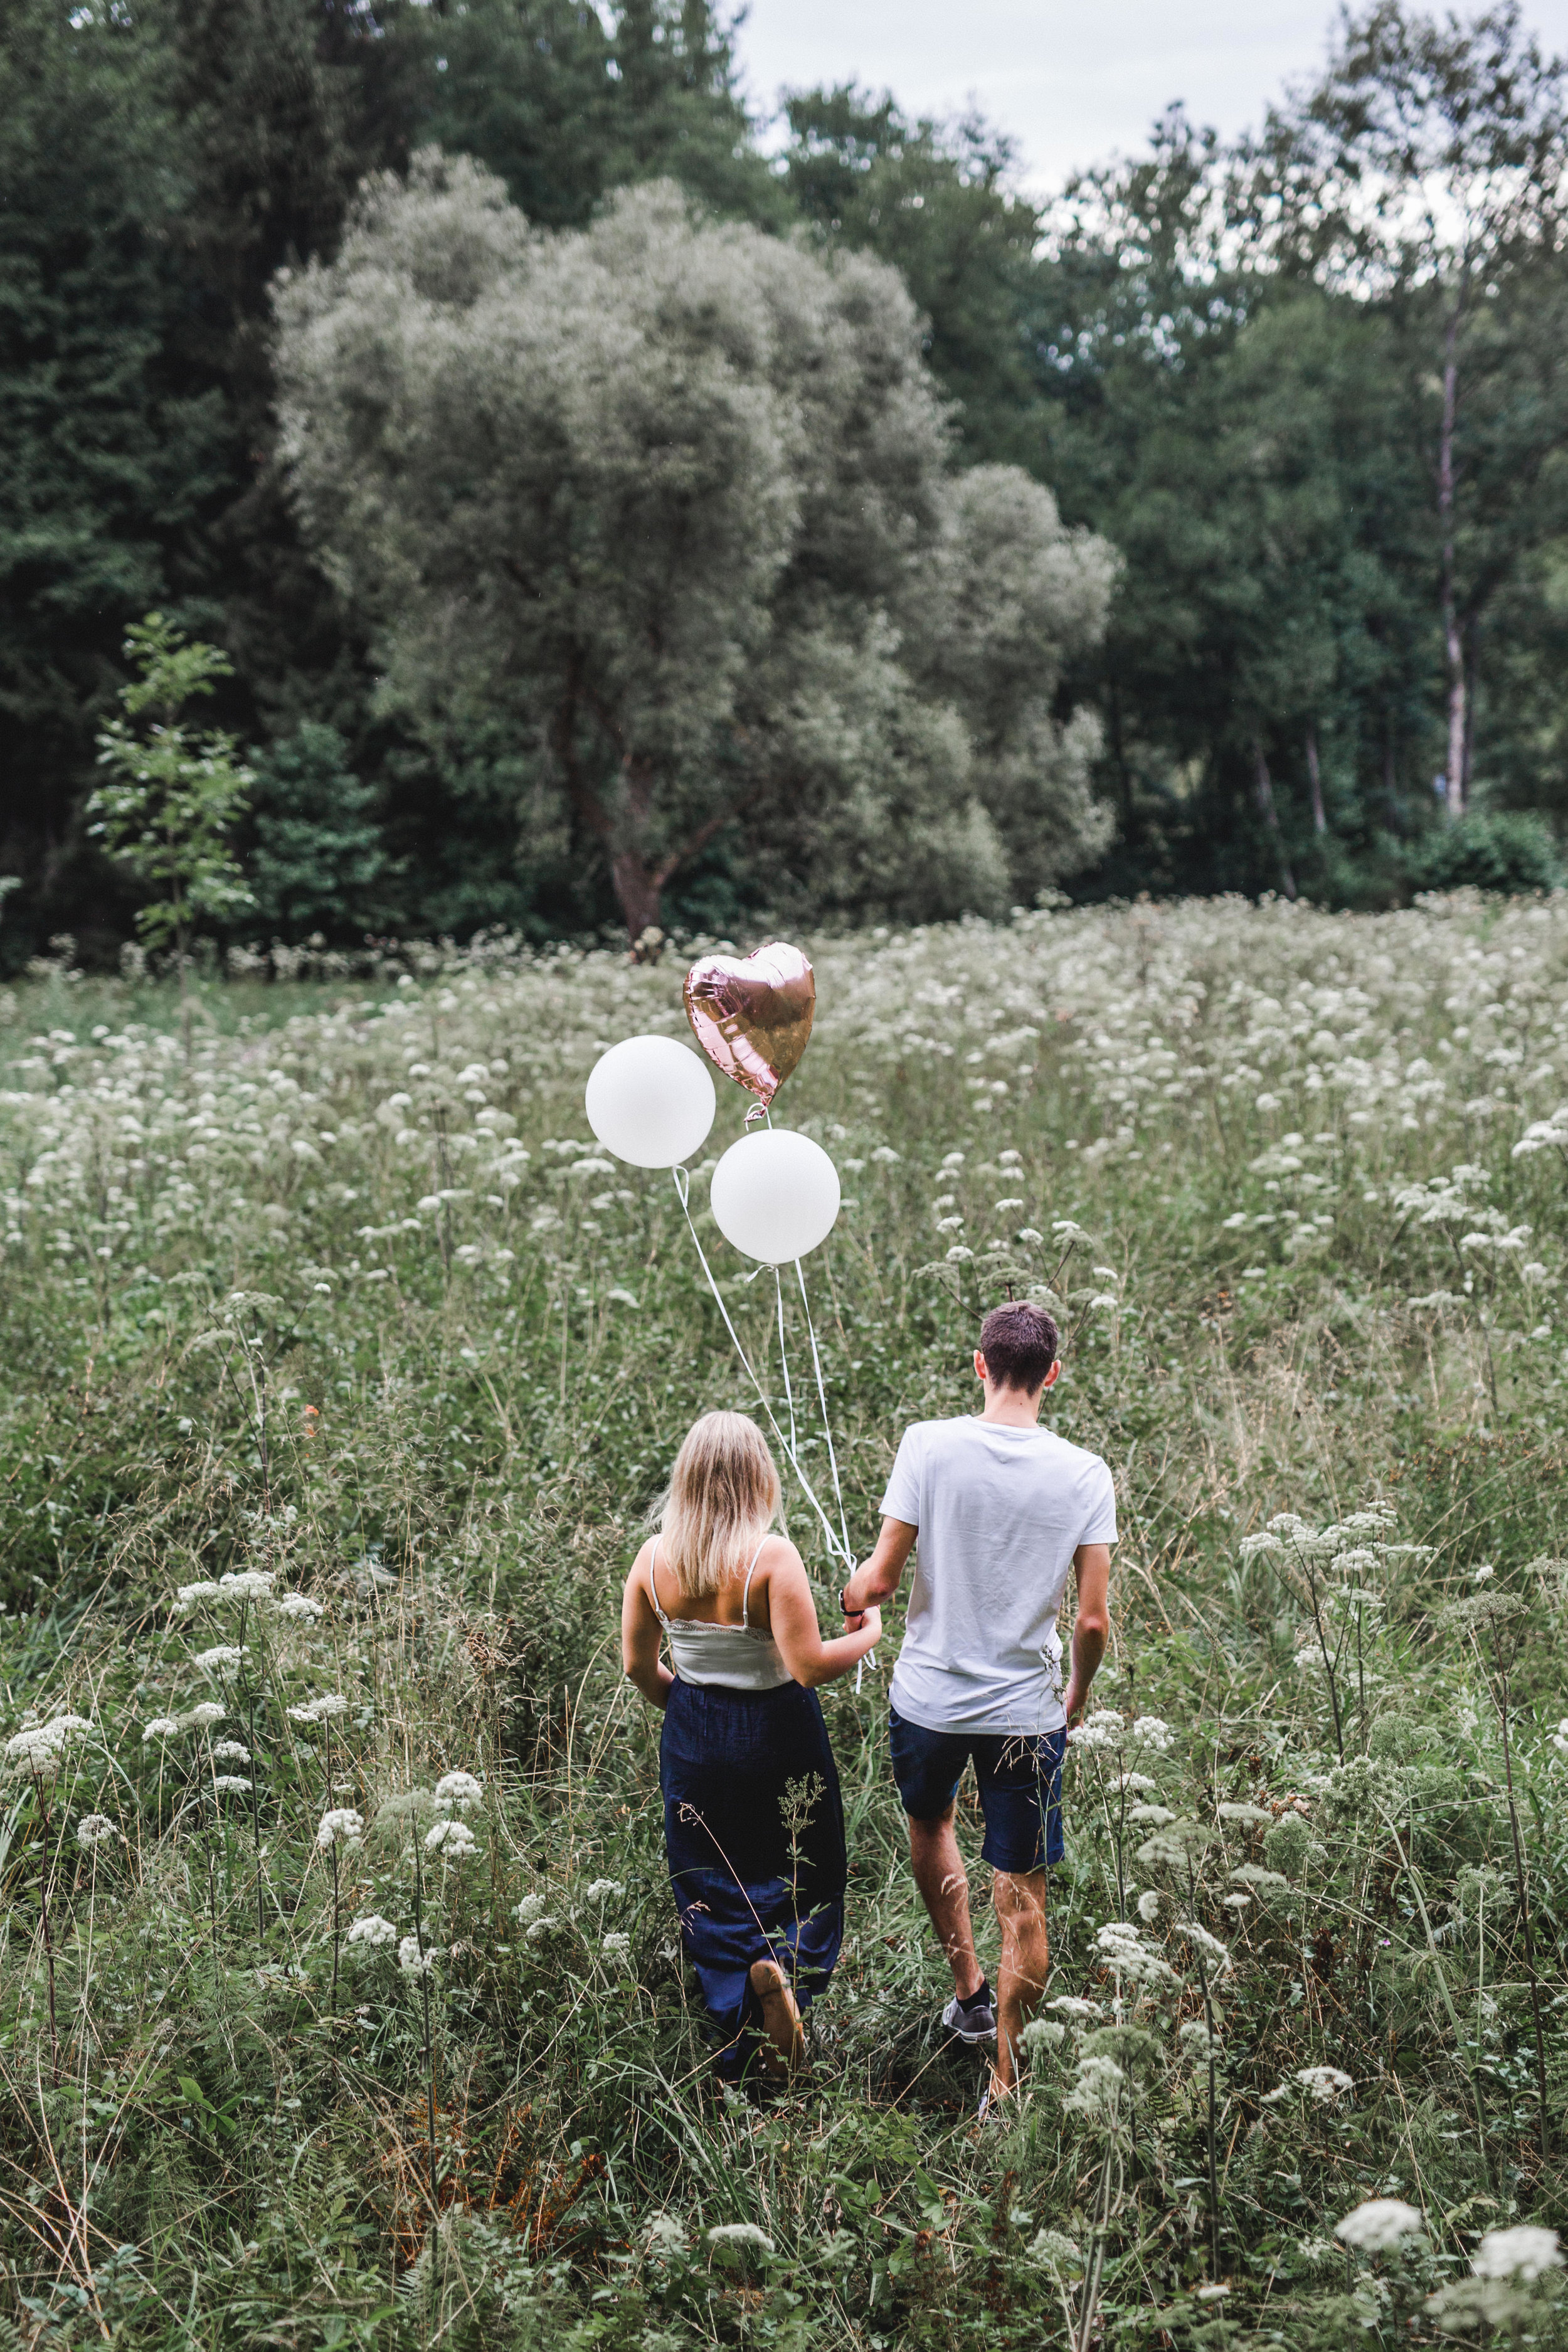 yessica-baur-fotografie-engagement-tübingen-022-0098.JPG